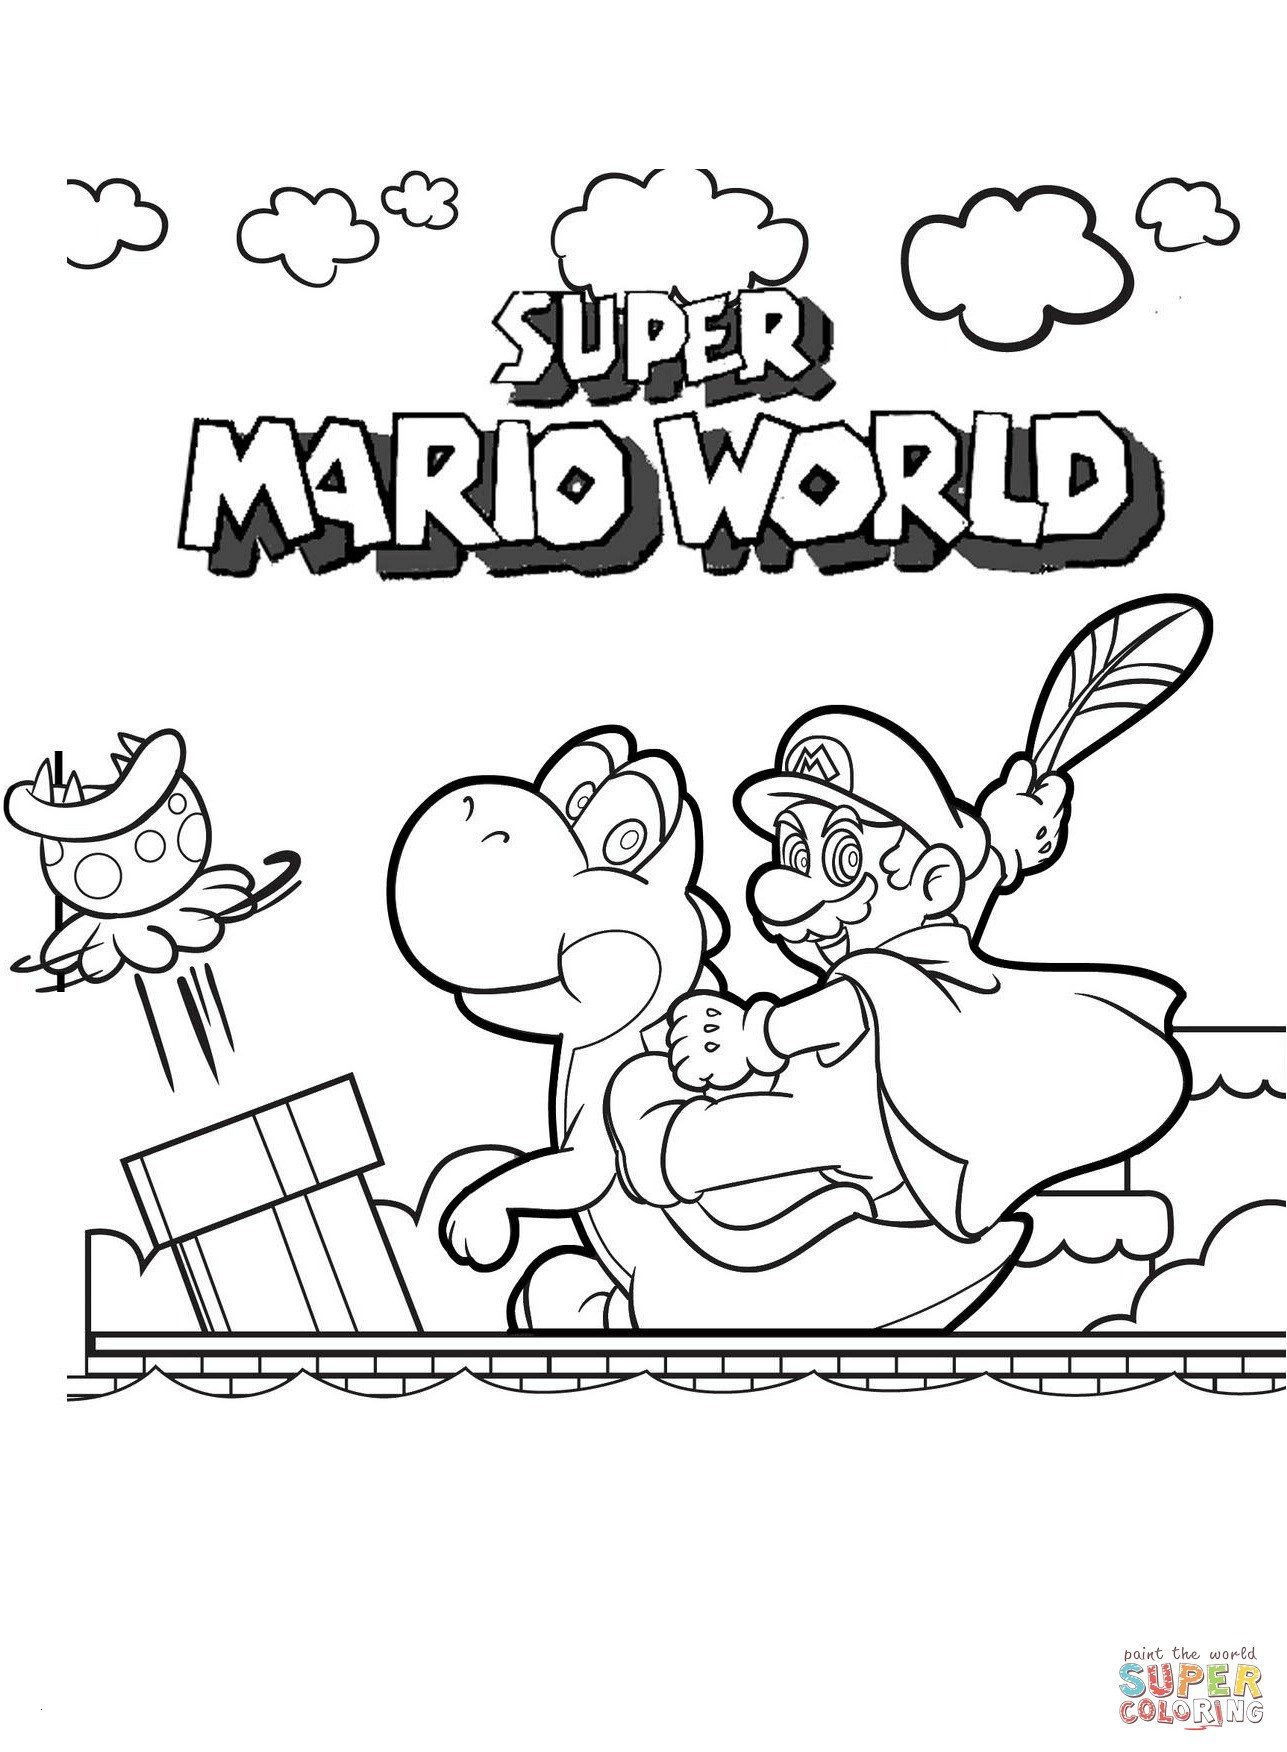 Super Mario Pilz Ausmalbilder Neu 37 Super Mario Kart Ausmalbilder Scoredatscore Inspirierend Super Bilder